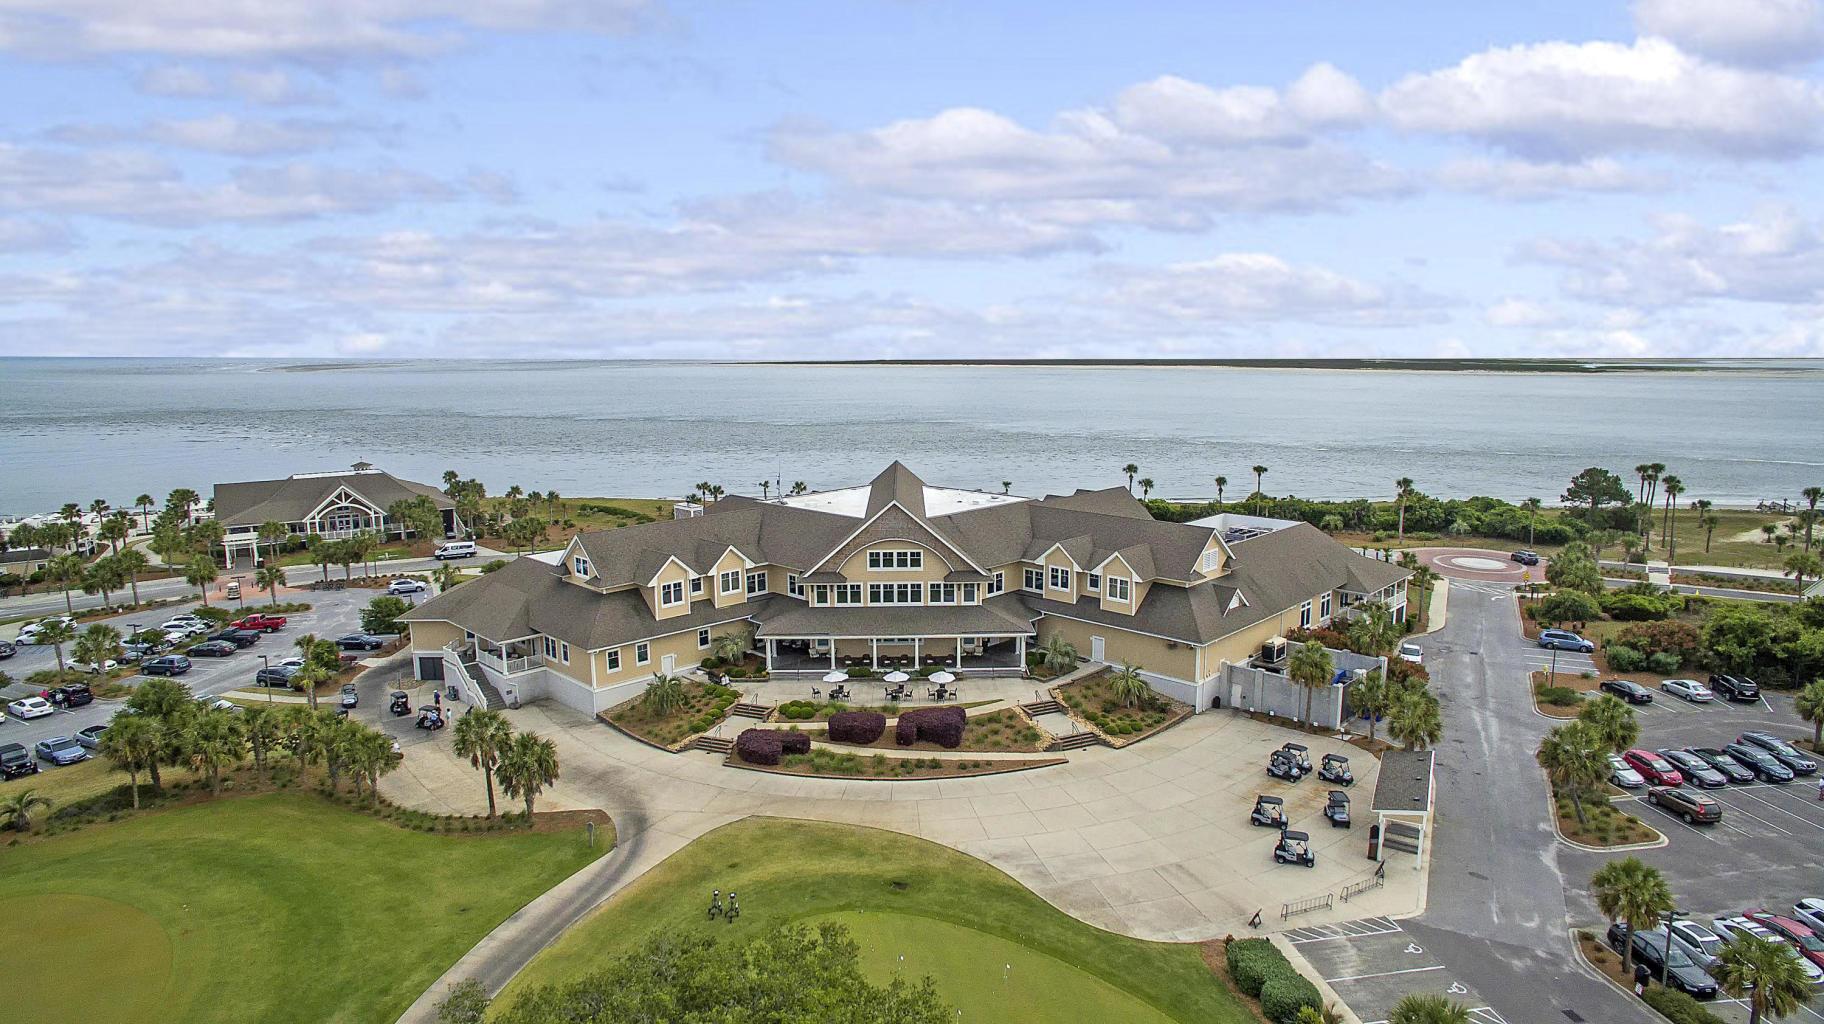 Seabrook Island Homes For Sale - 2856 Captain Sams, Seabrook Island, SC - 9